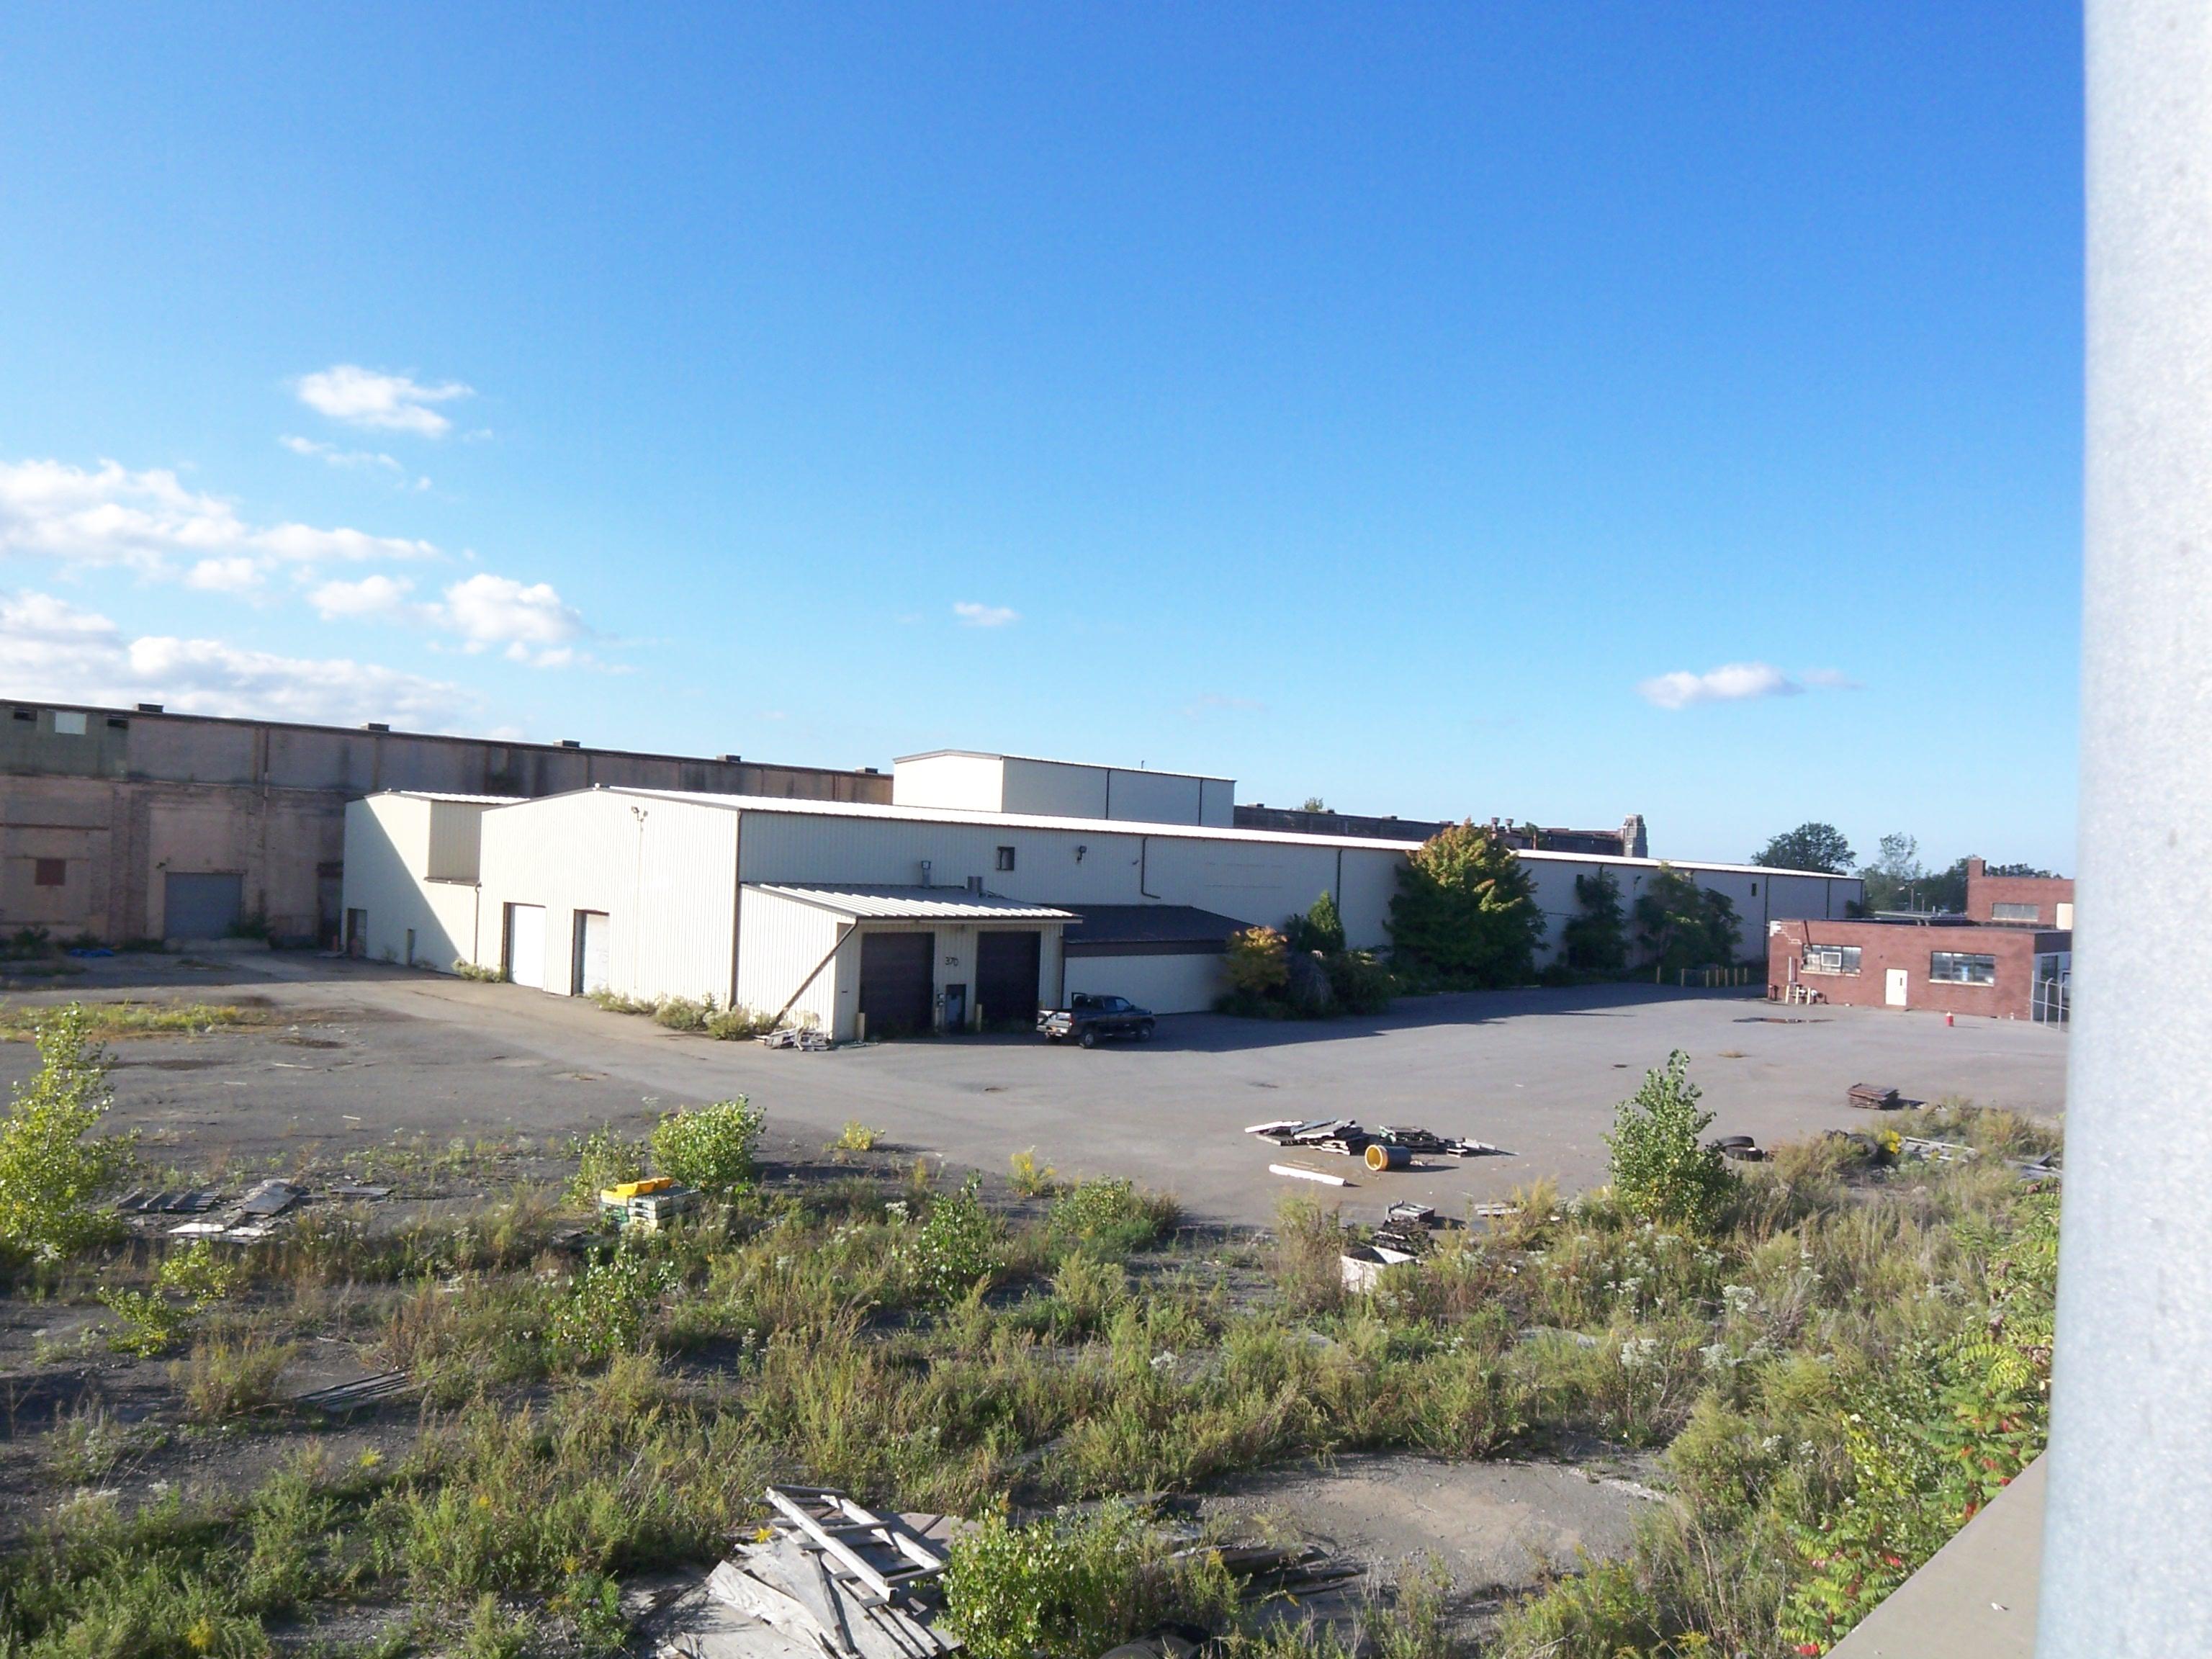 1167 Clinton St Buffalo Ny Hastings Cohn Real Estate